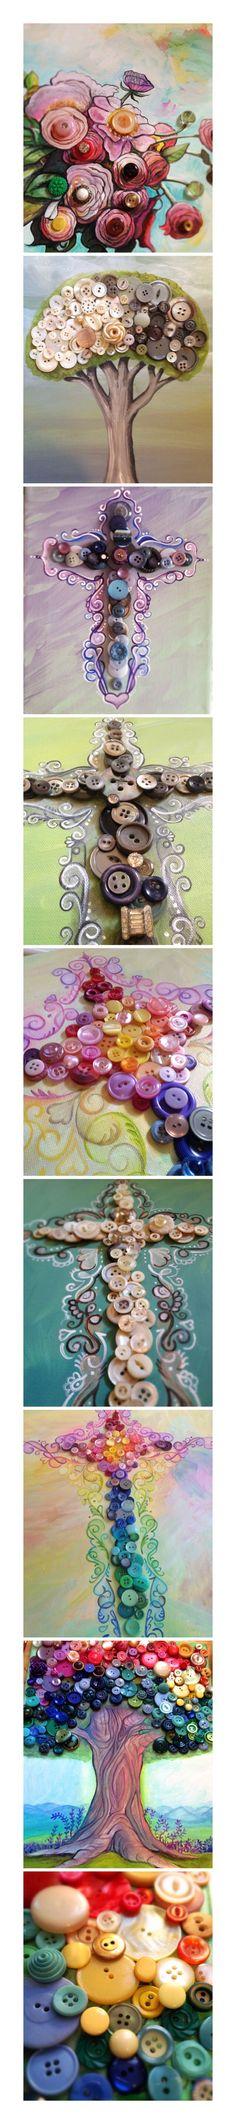 Grandma's vintage button collection in art - by Beth Snider/penelopeinmypocket.com